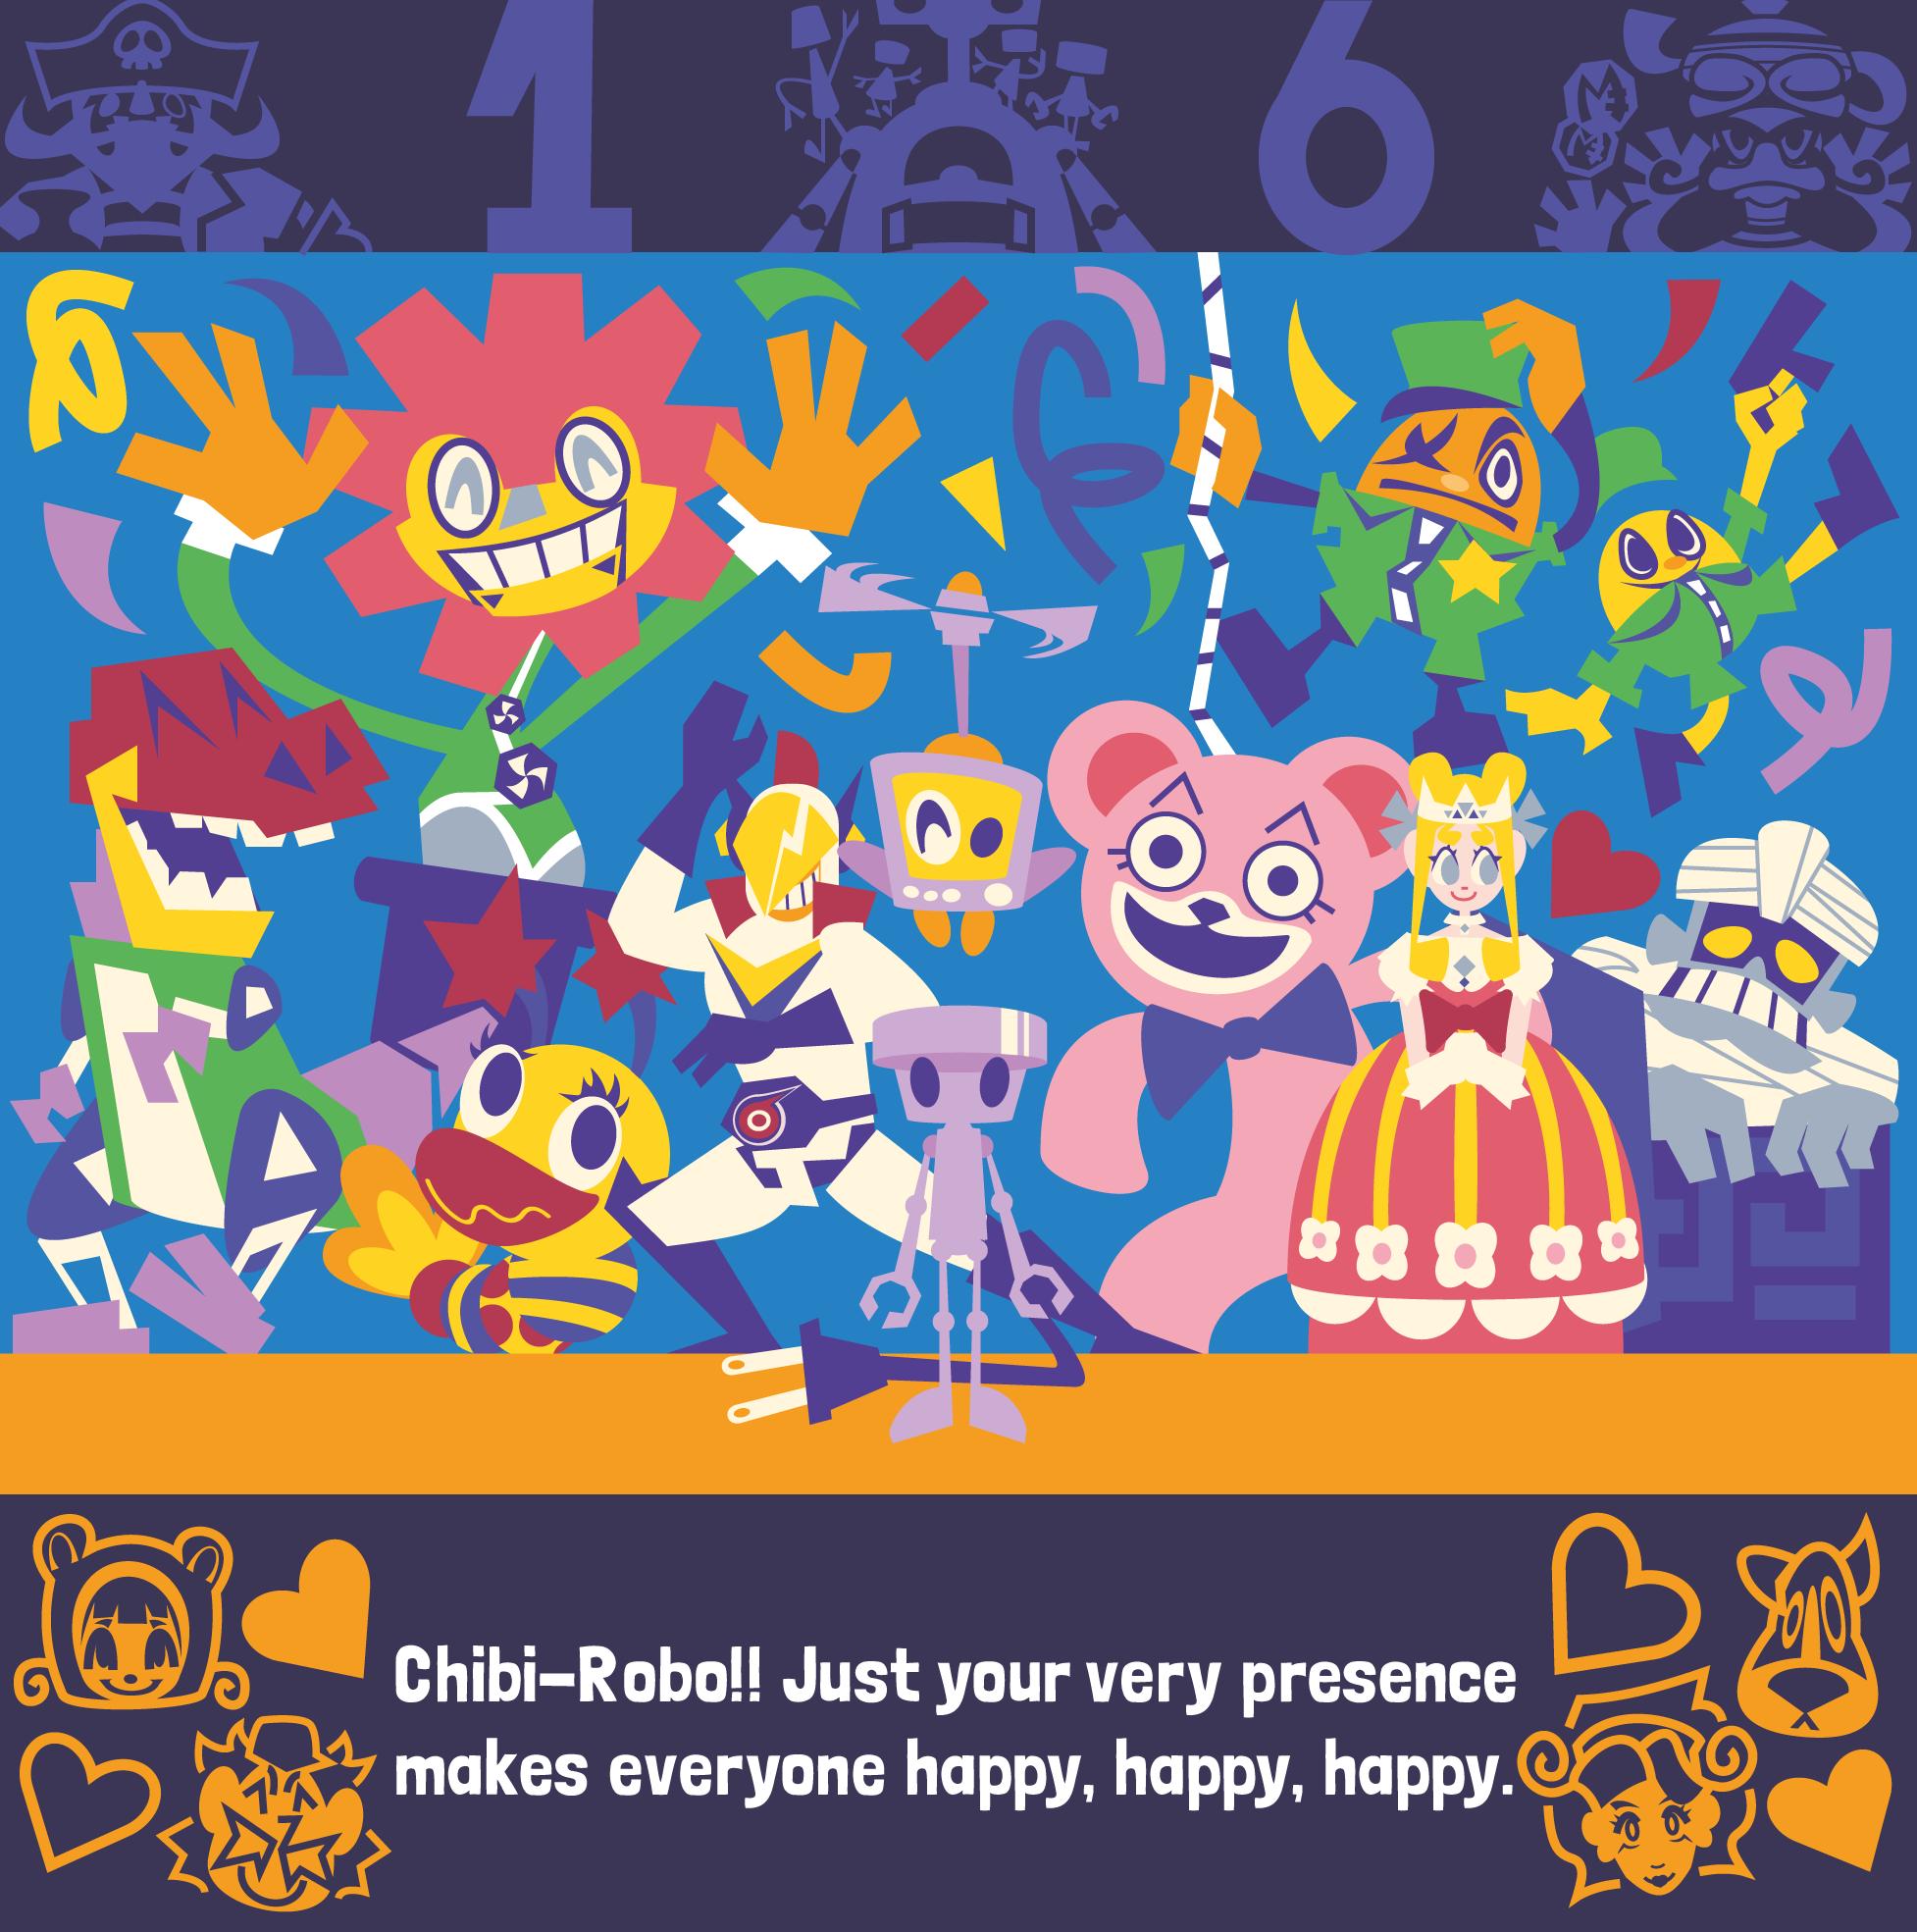 Happy Birthday, Chibi-Robo!!!